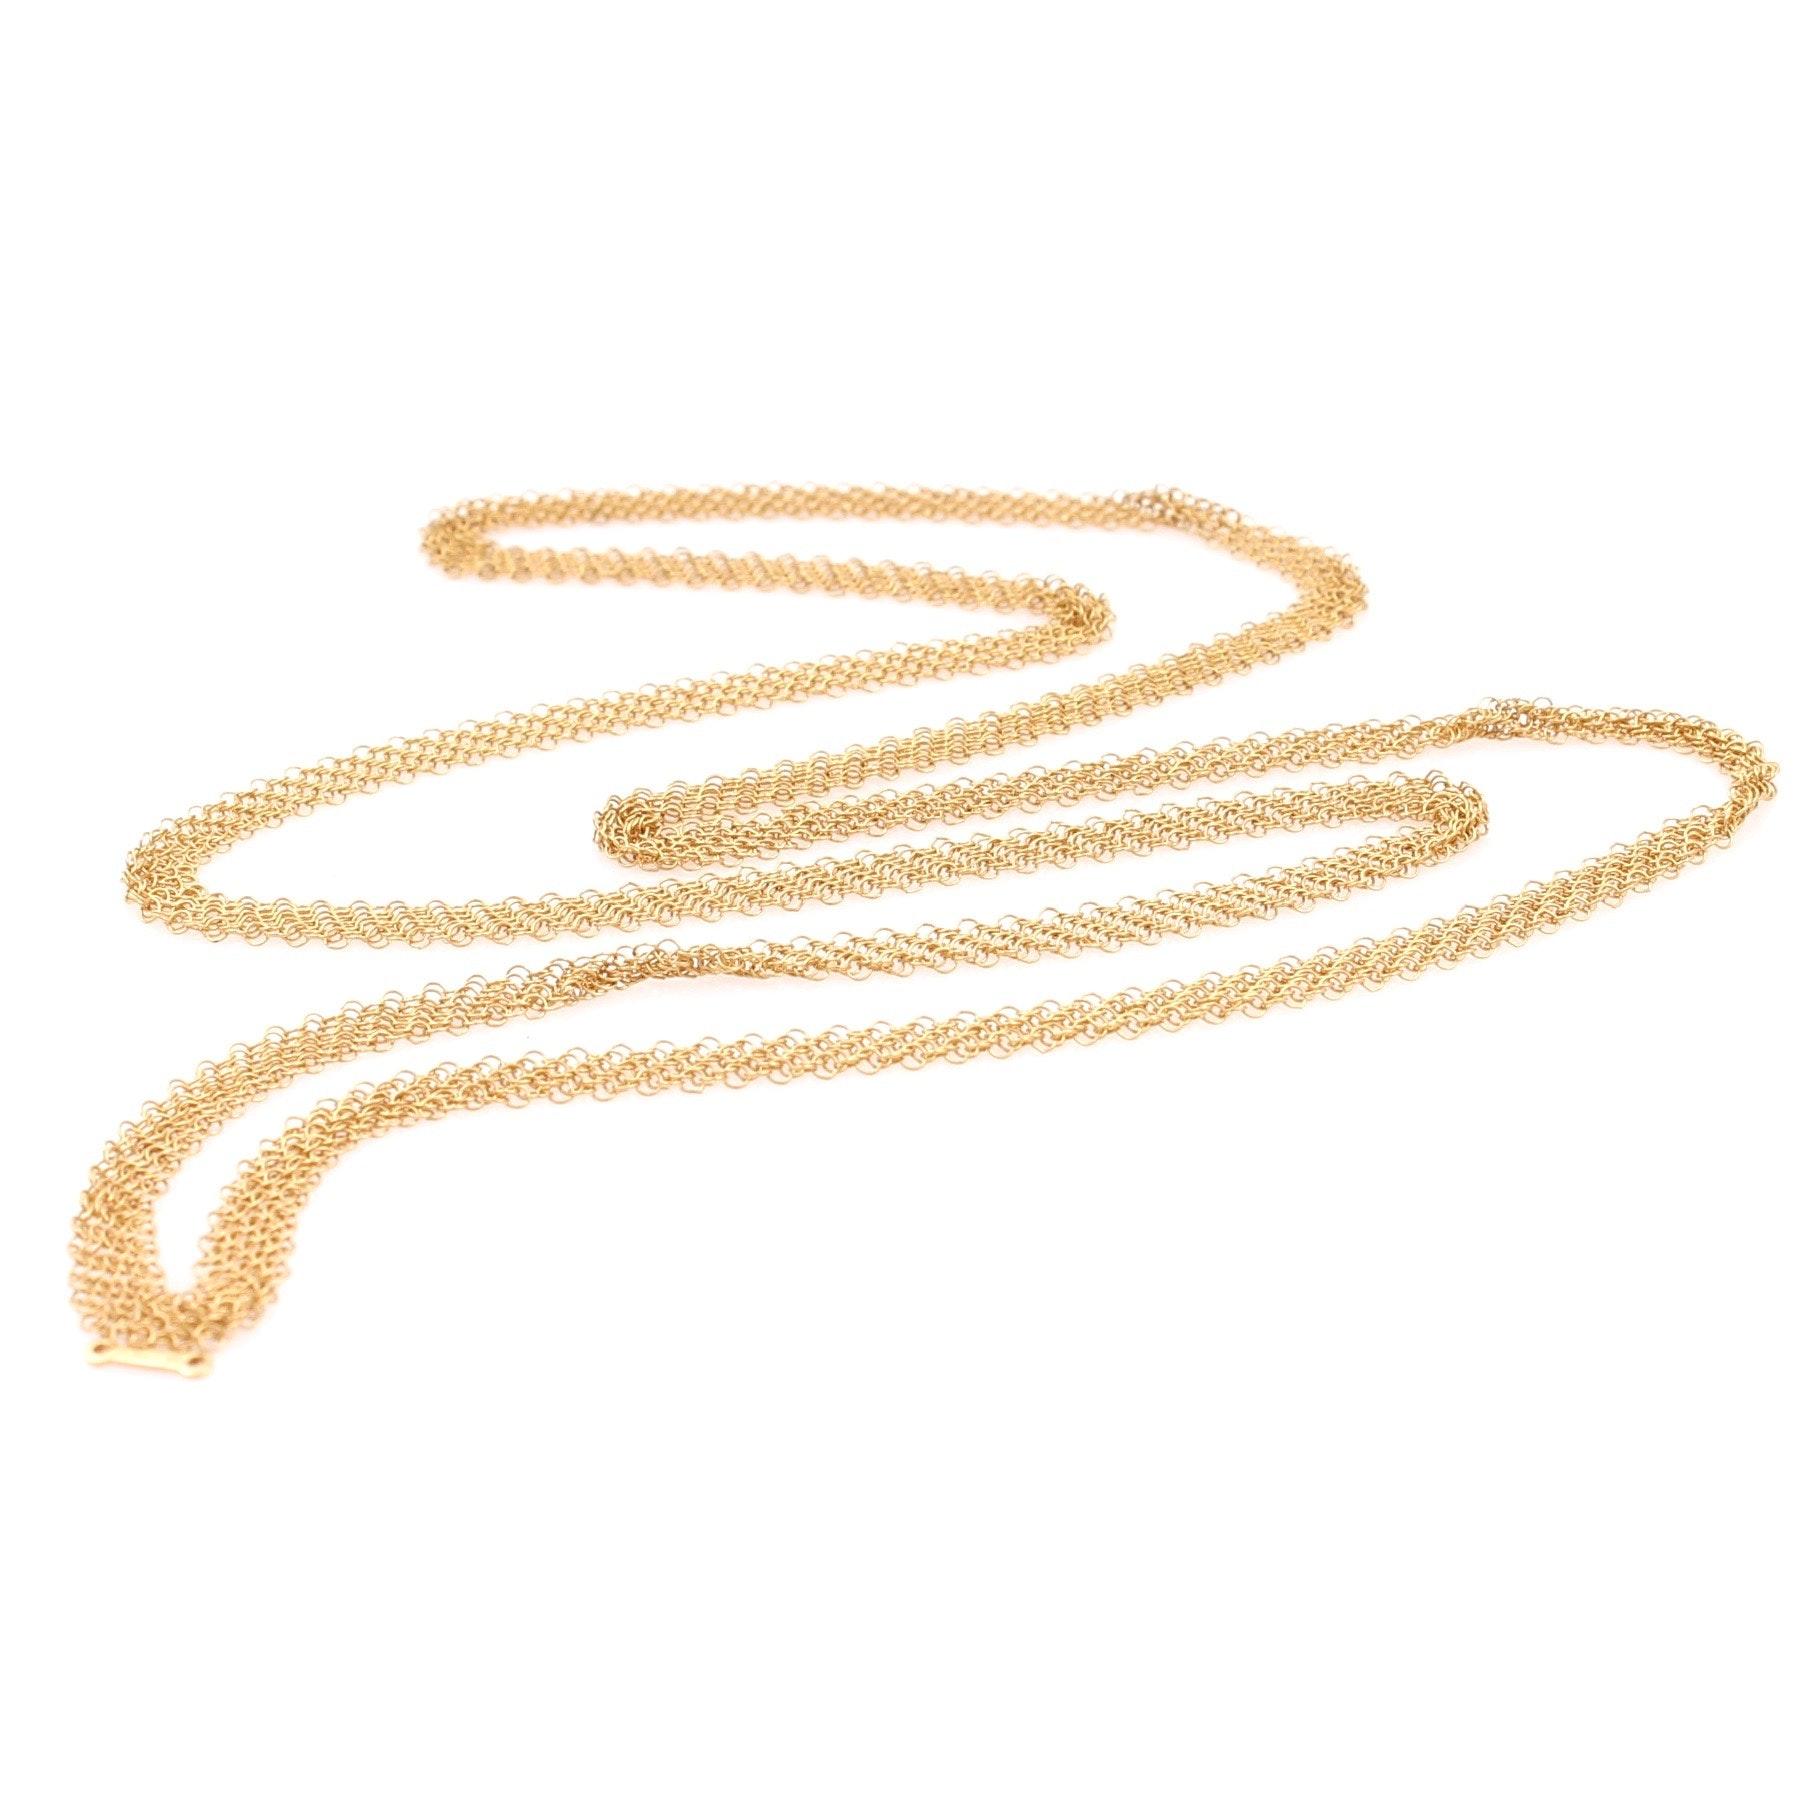 Elsa Peretti Tiffany & Co. 18K Yellow Gold Mesh Necklace